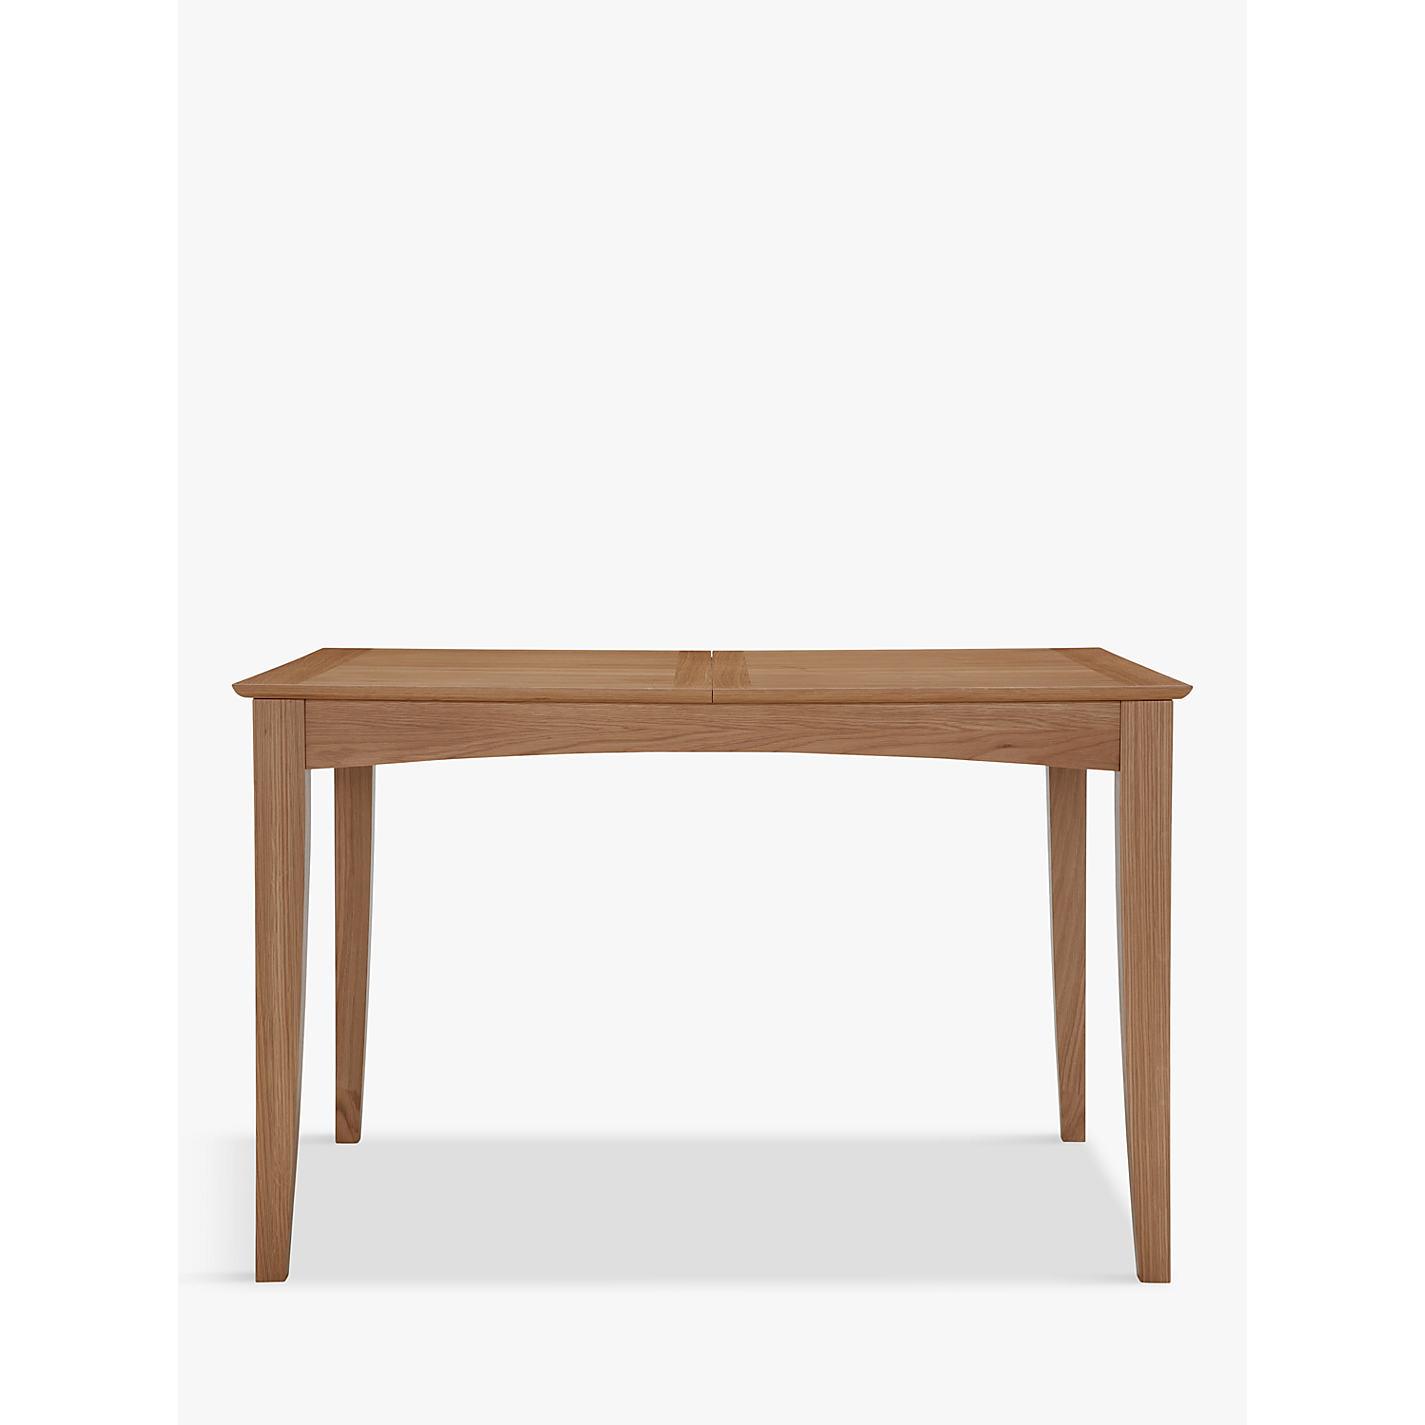 Folding side table john lewis -  Buy John Lewis Alba 4 6 Seater Extending Dining Table Online At Johnlewis Com